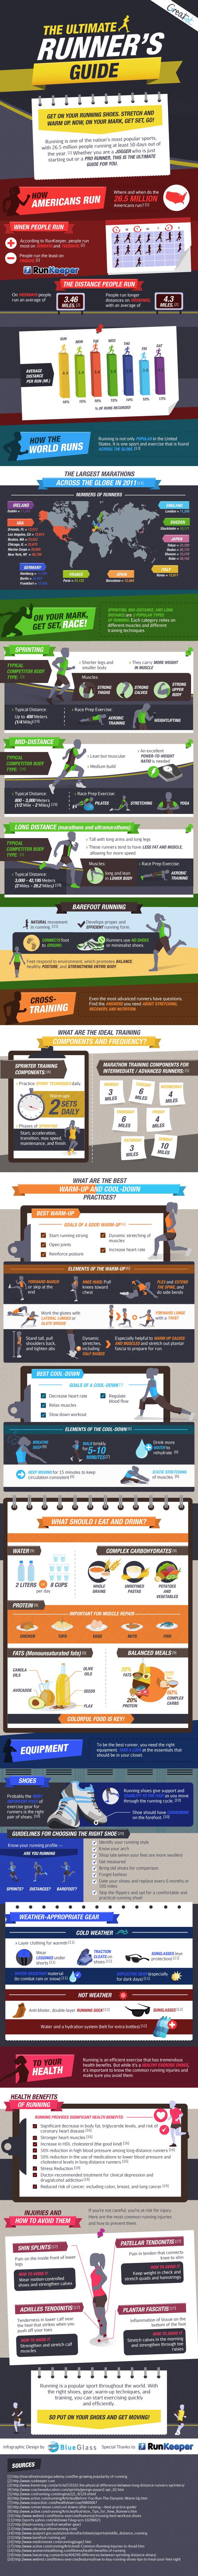 infografia sobre runners